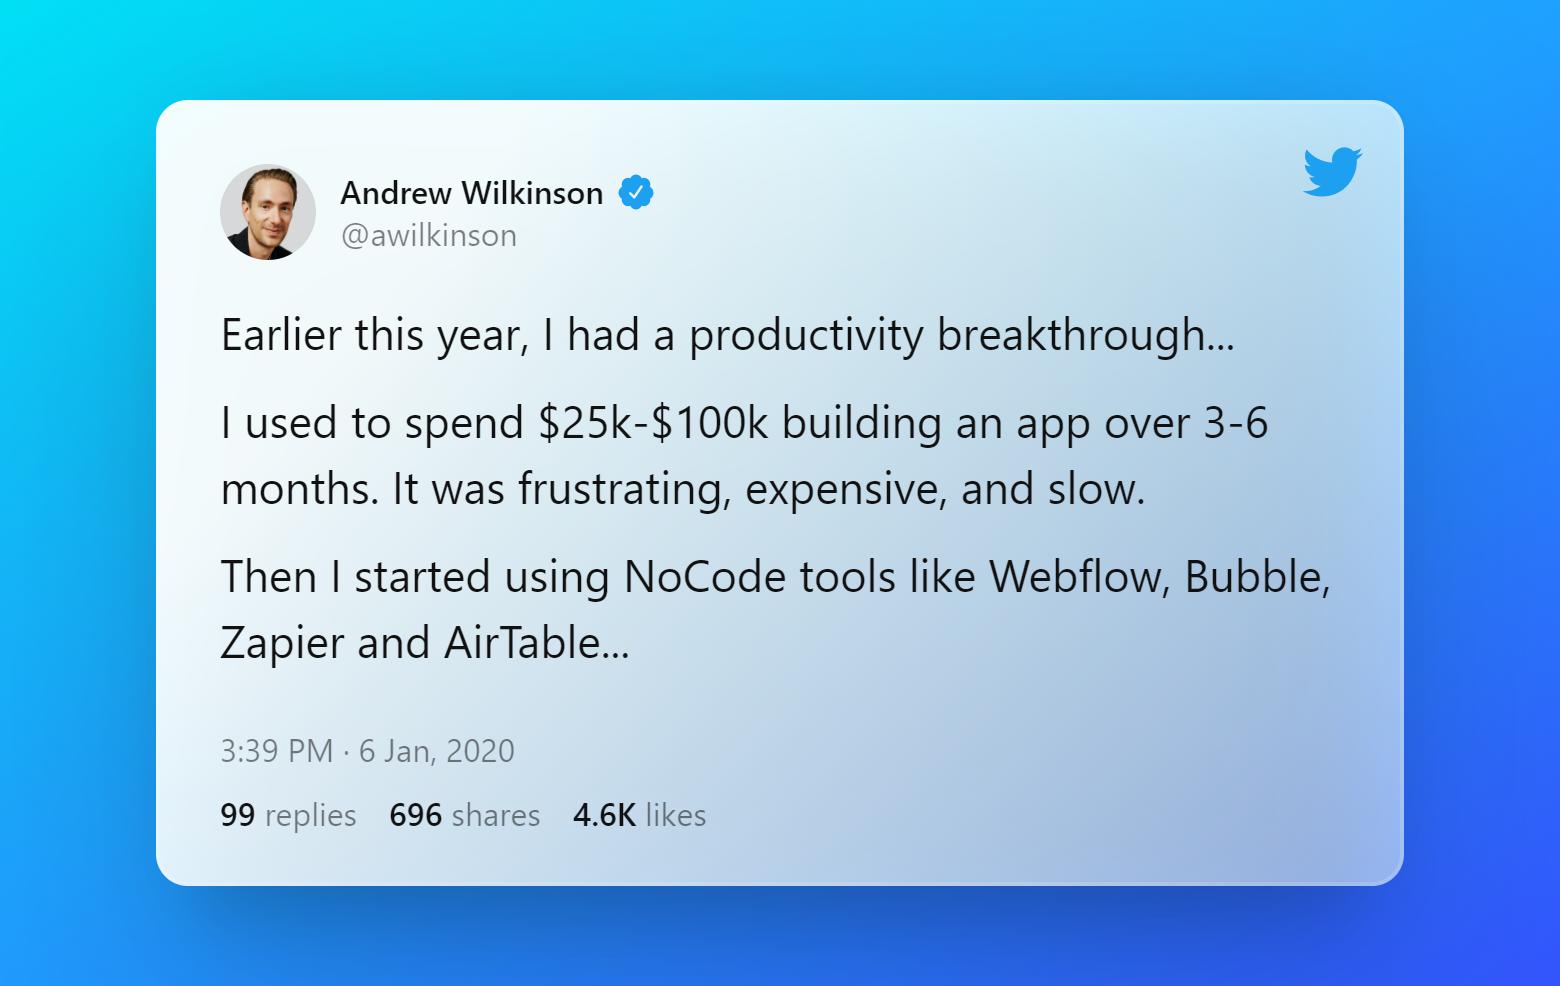 Tweet by Andrew Wilkinson